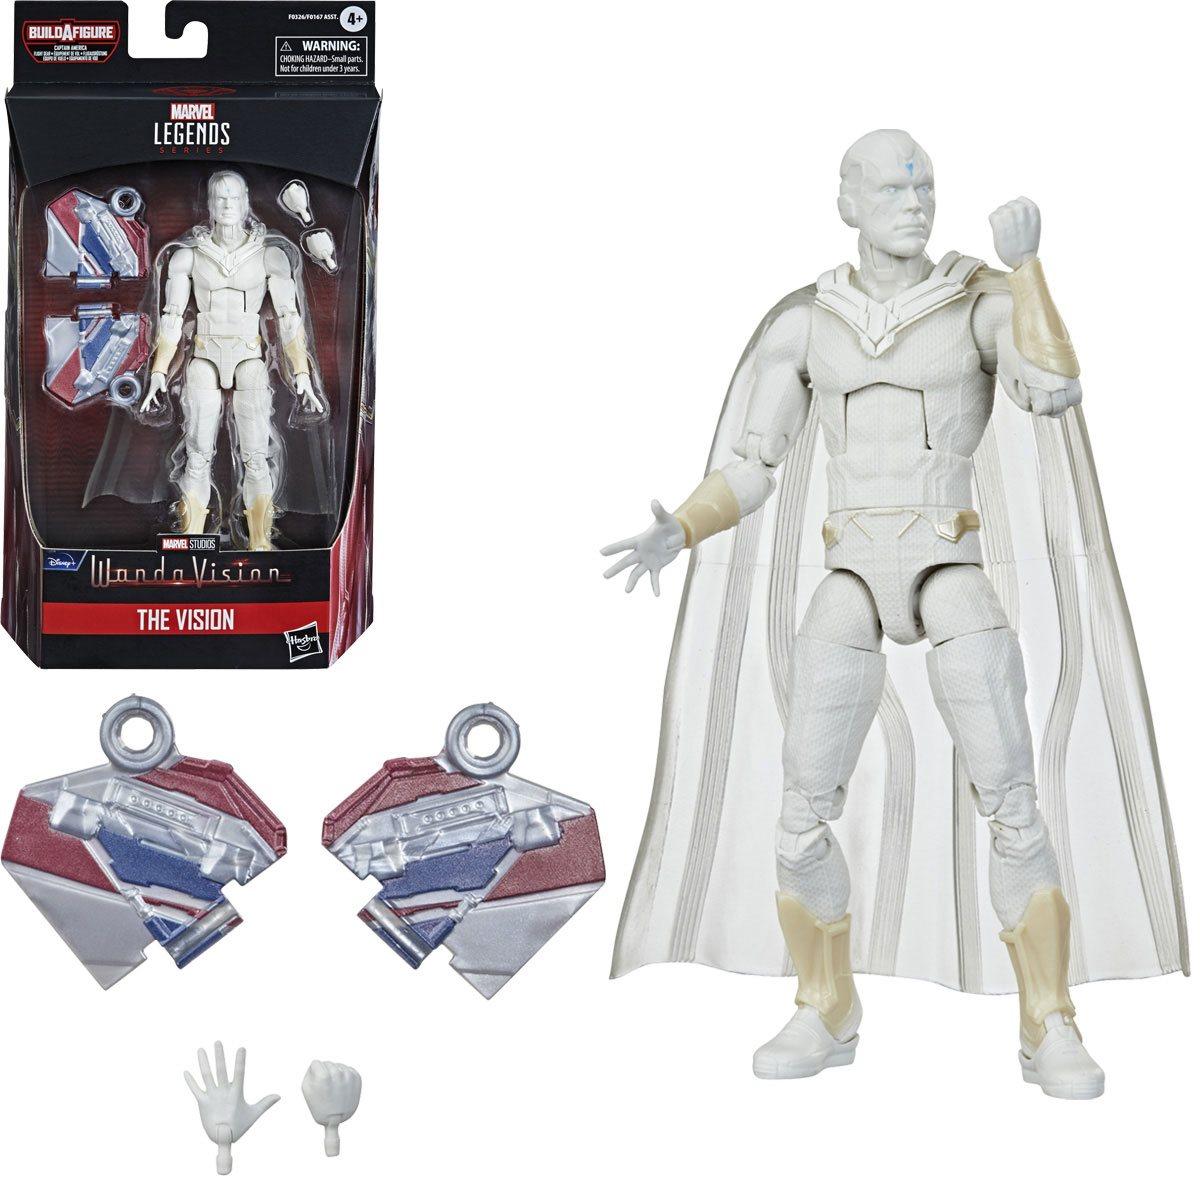 Marvel Legends Vision 6 Inch Action Figure.  Build-A-Figure Cap America Flight Gear